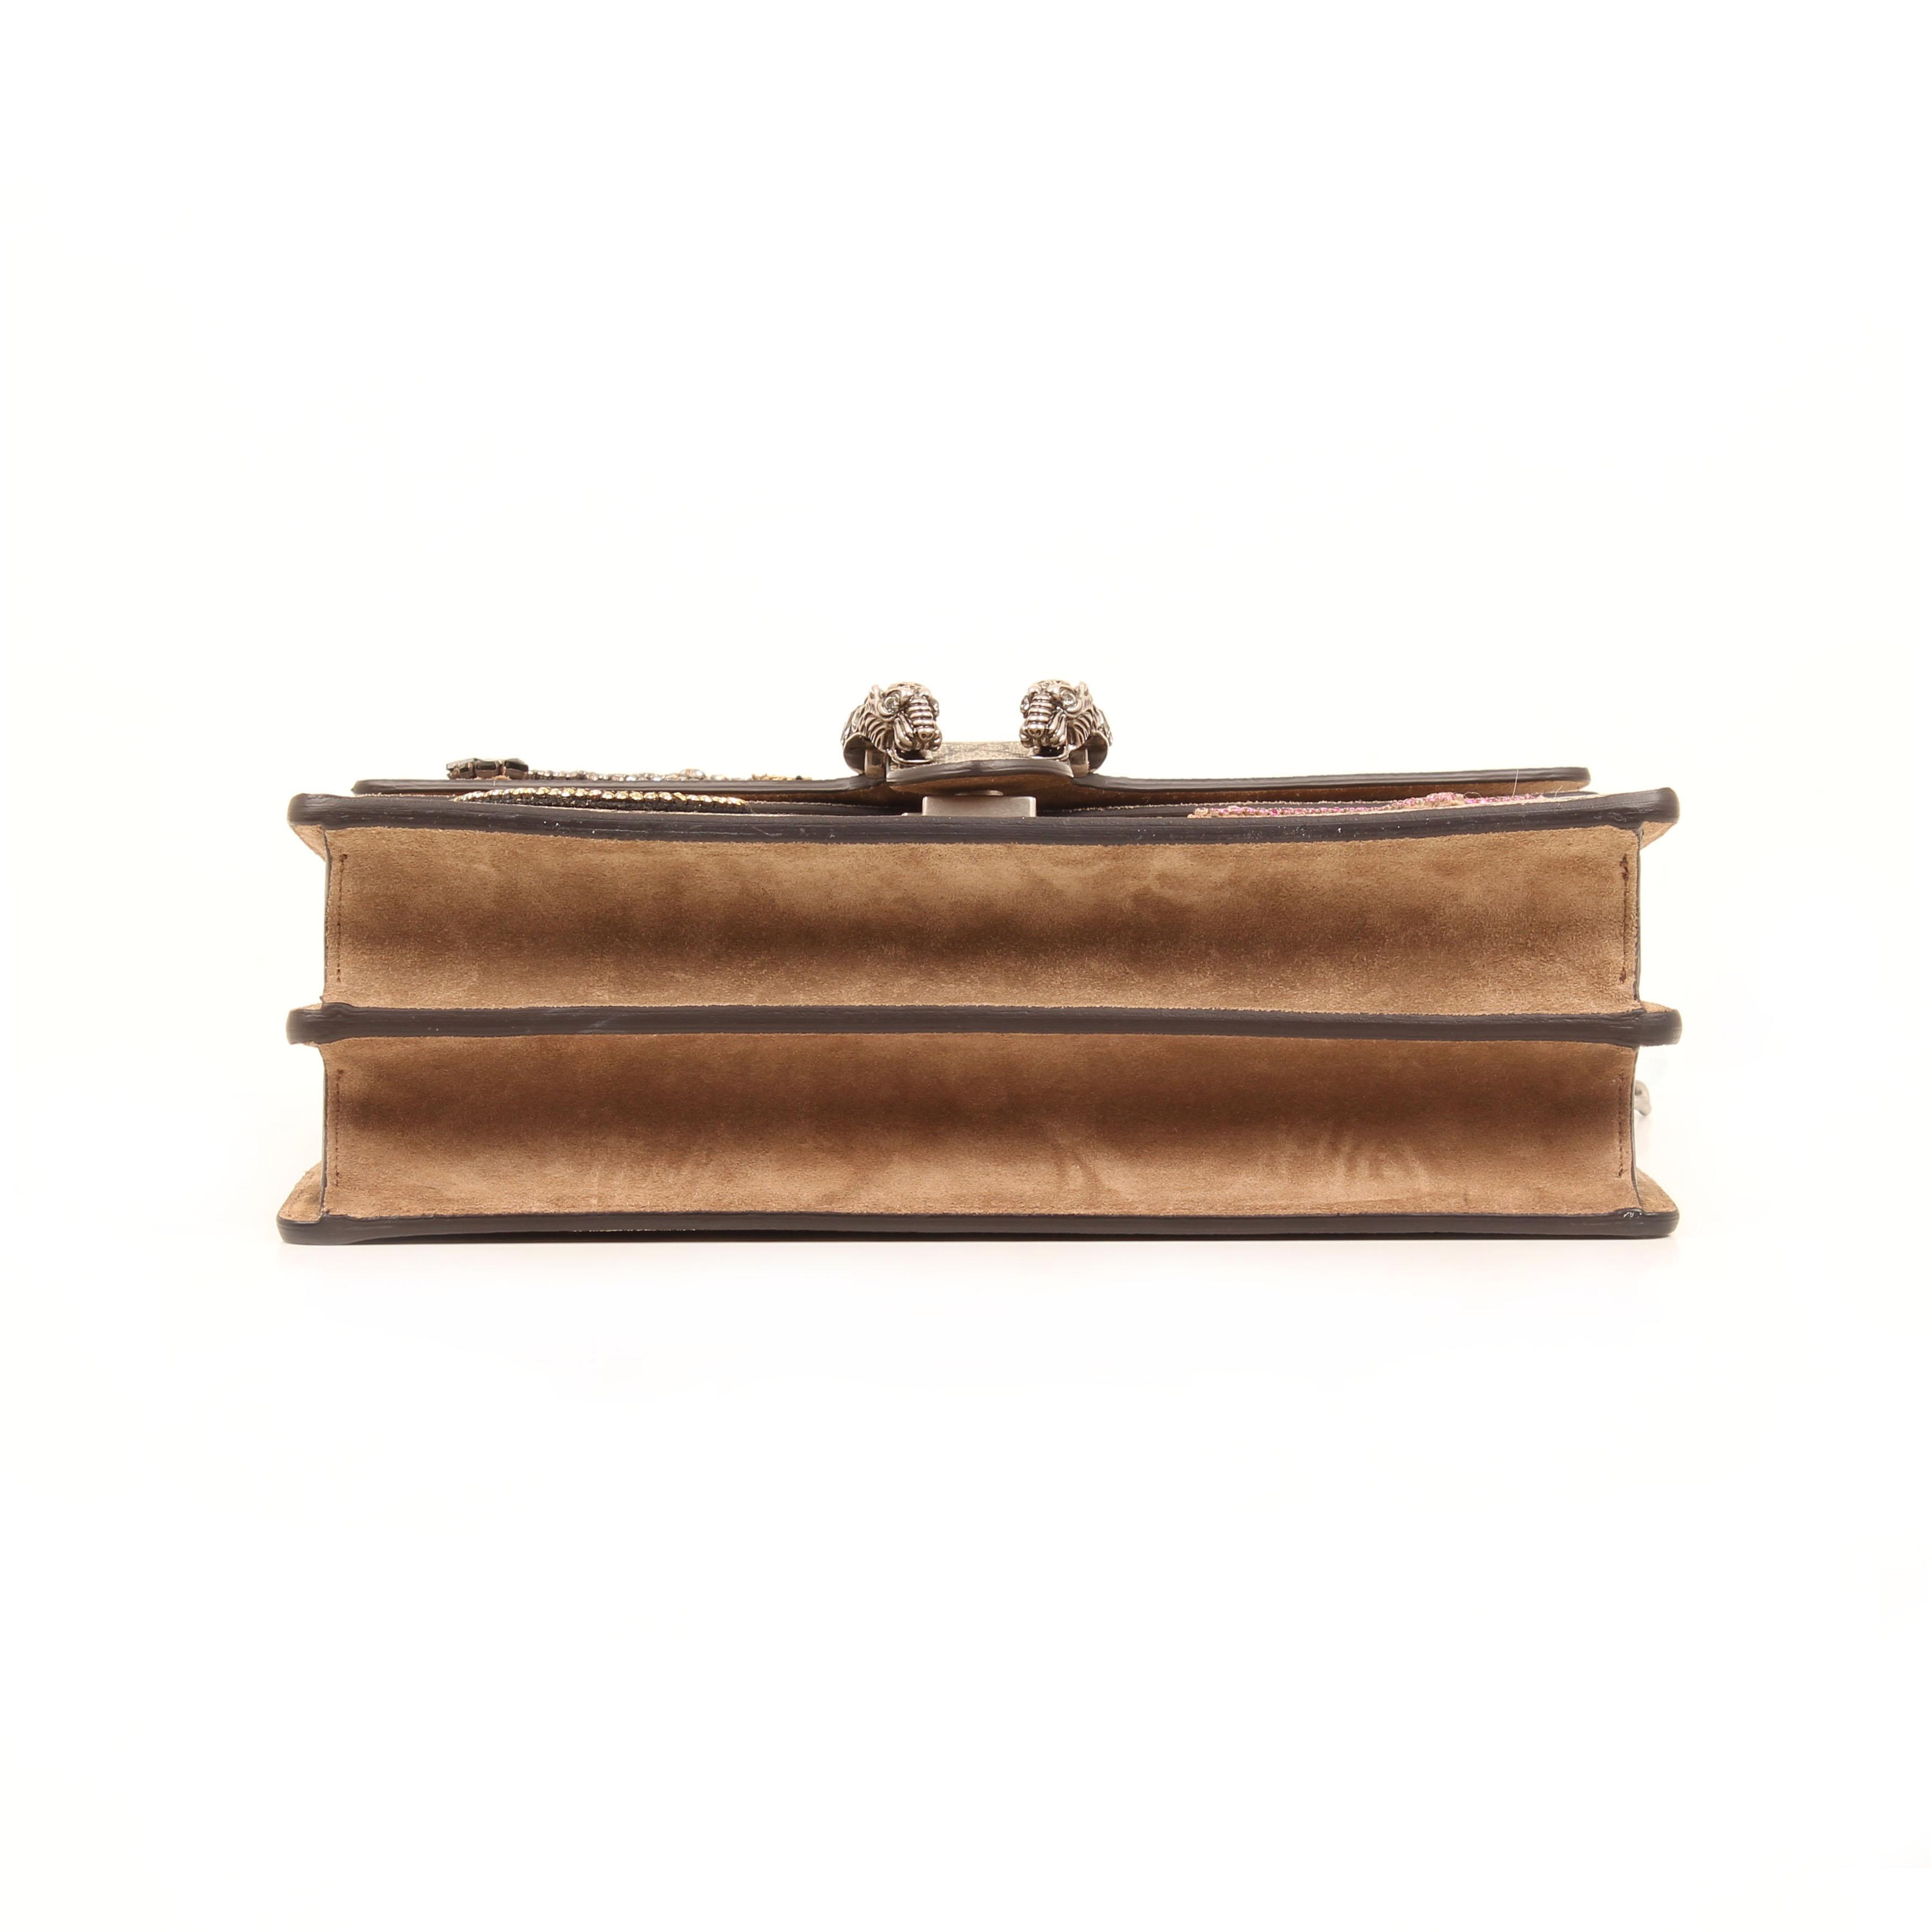 gucci shoulder bag dionysus embroidered rhinestones suede taupe gg supreme canvas bottom